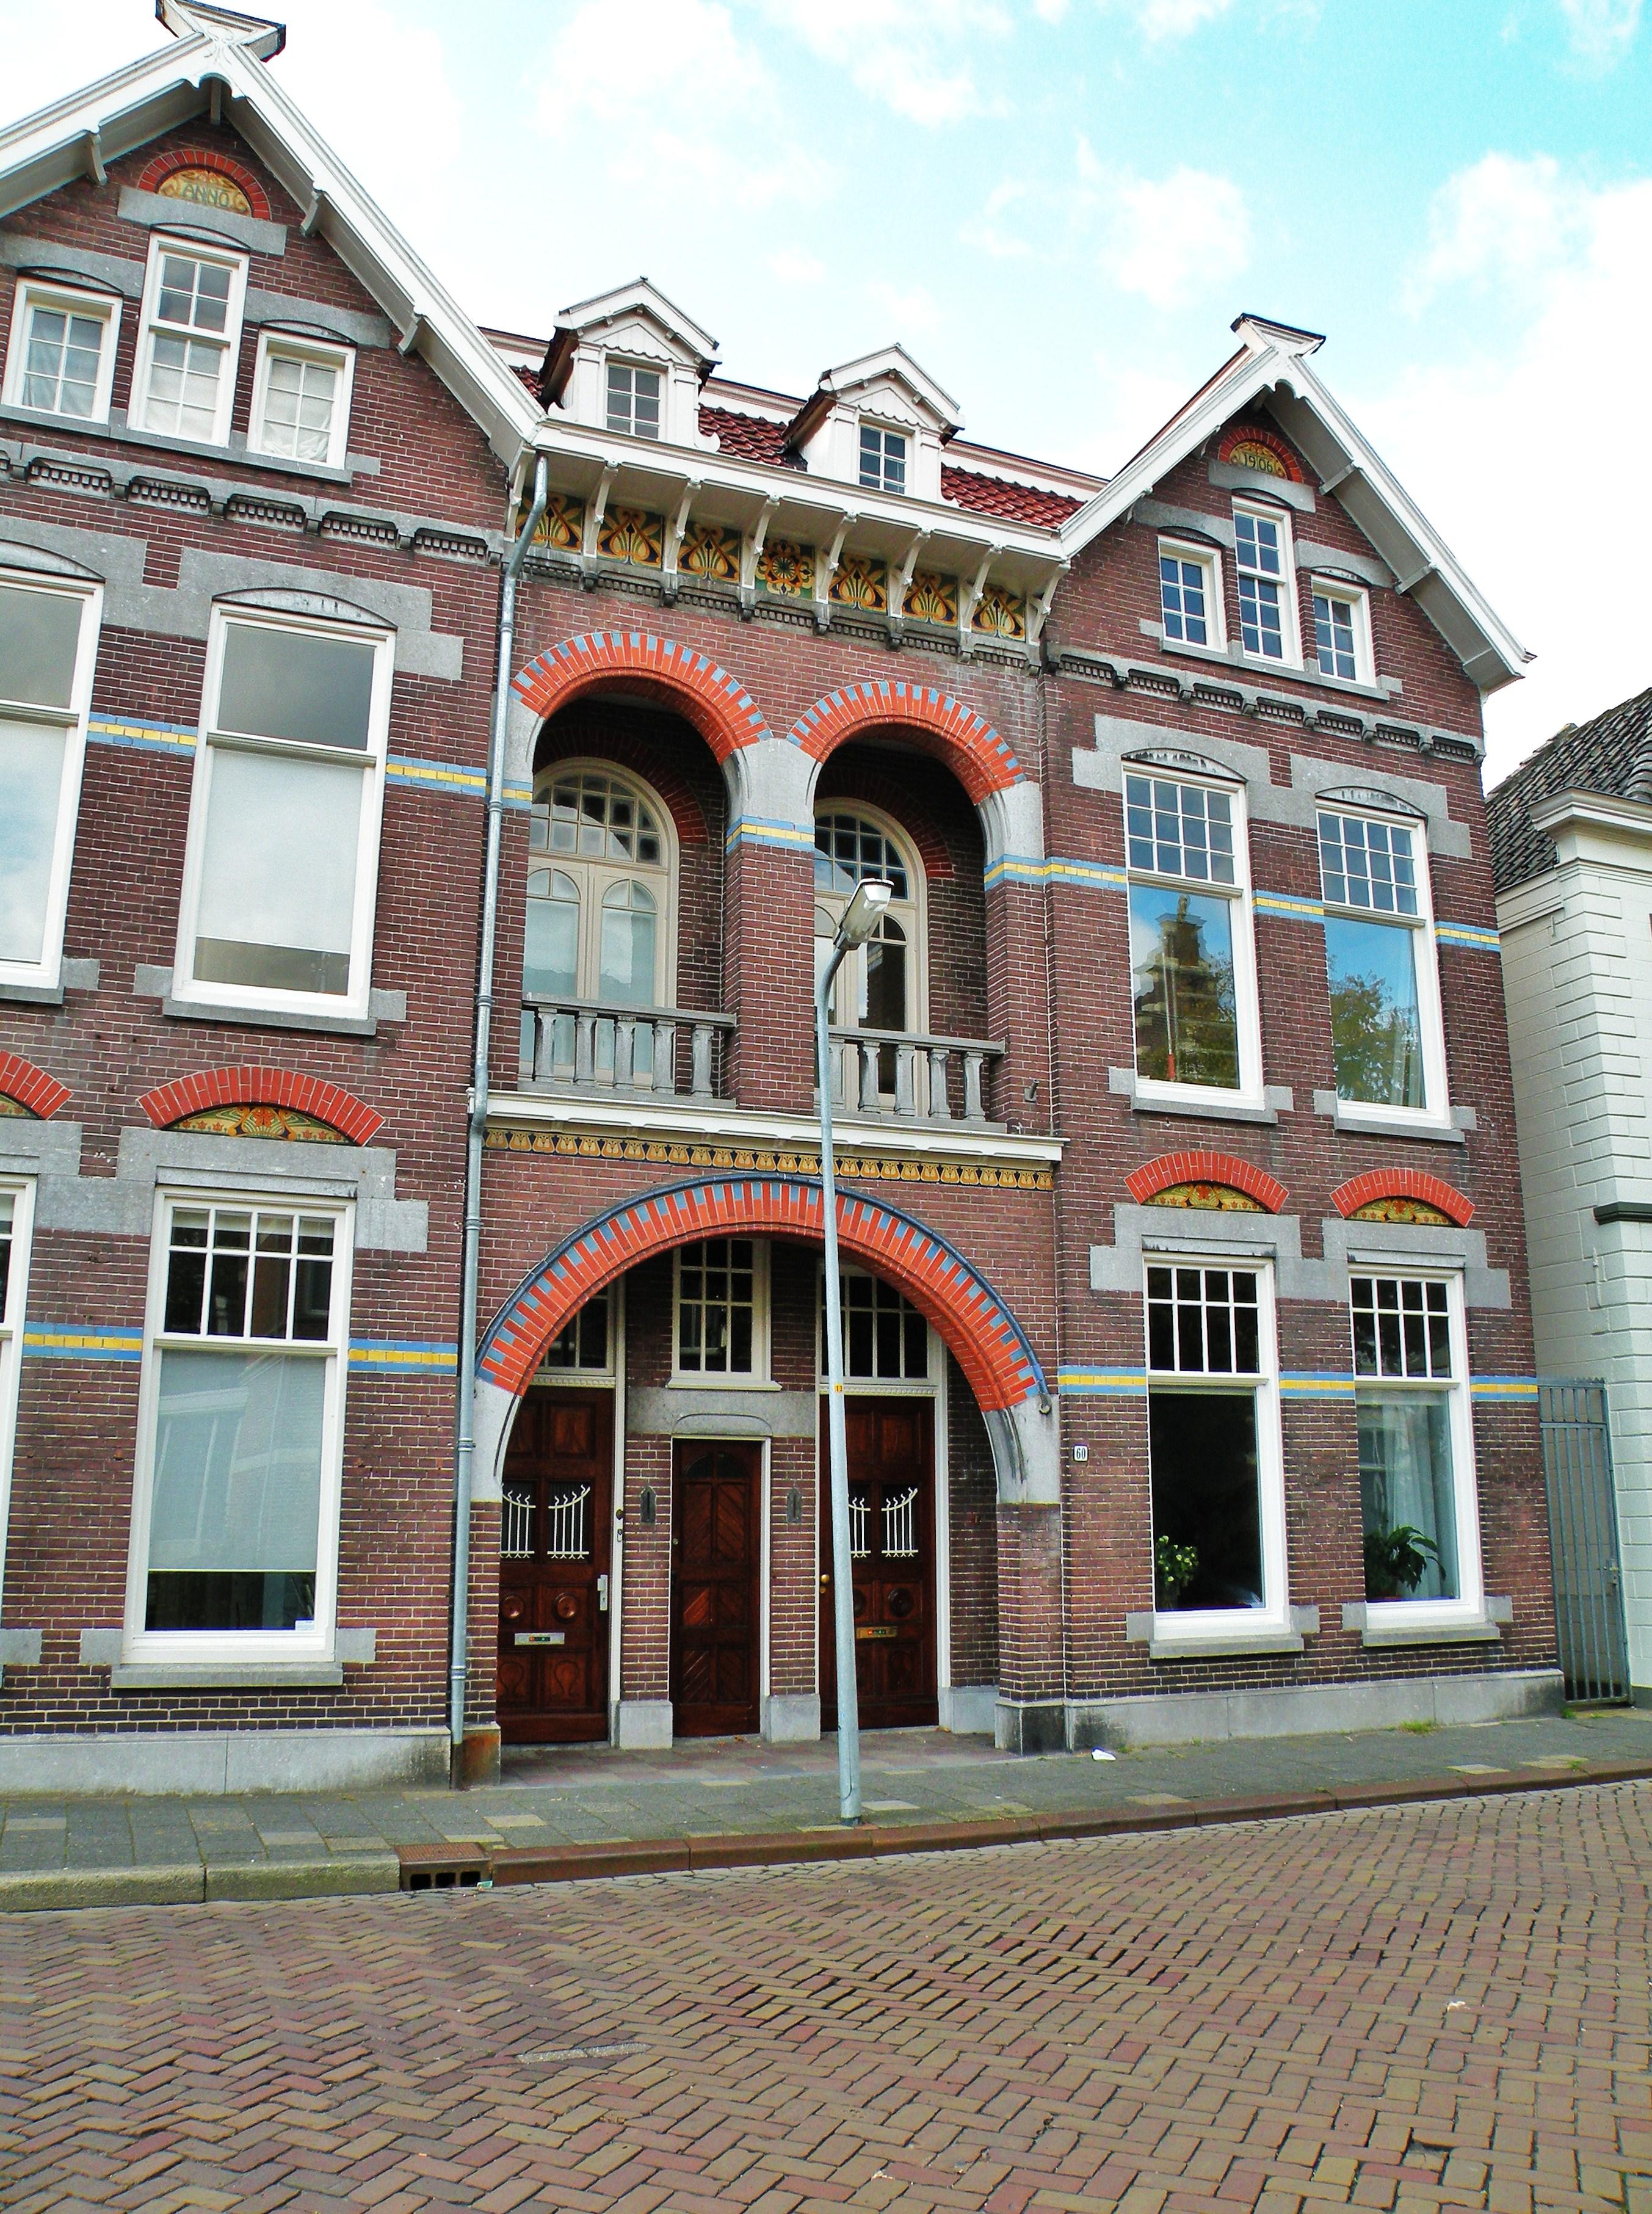 Aangeboden door: Stichting Microtoerisme InZicht Fotoblog Meppel Zuideinde 60-62 Jugendstil woonhuis